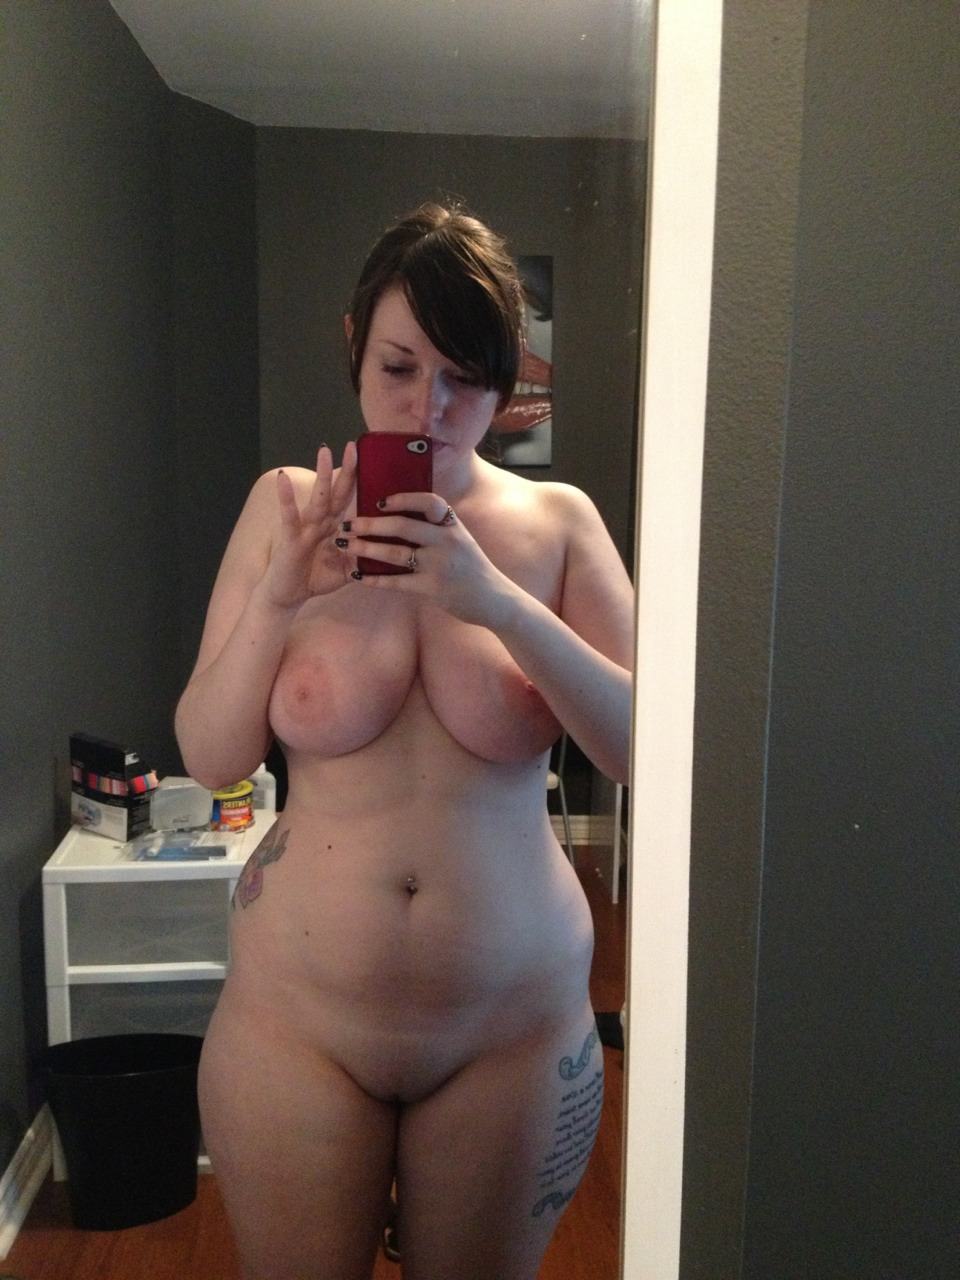 Fat Moms Nude Selfie